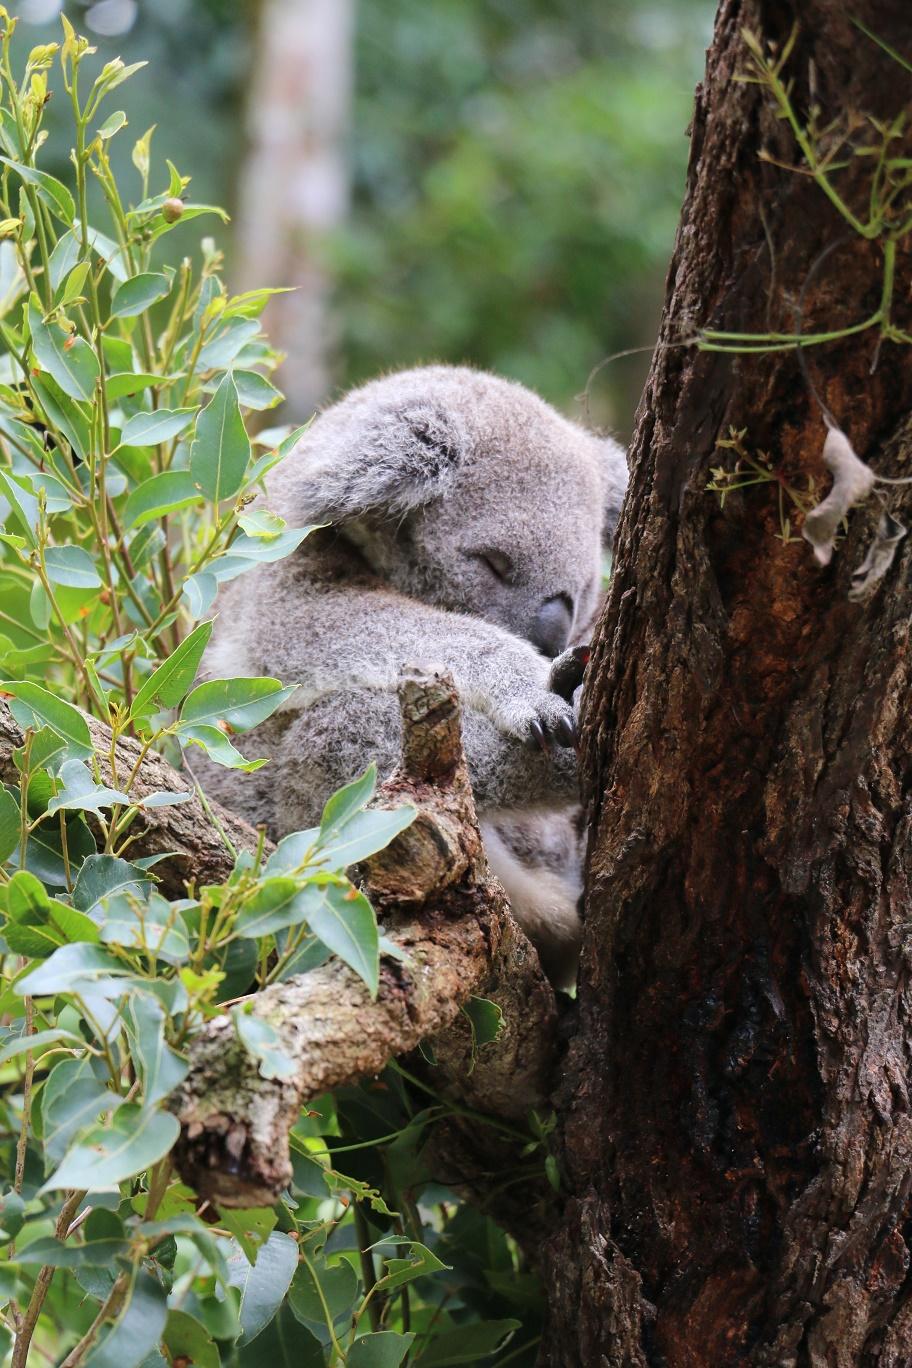 kuranda-koala-gardens-4-thebraidedgirl